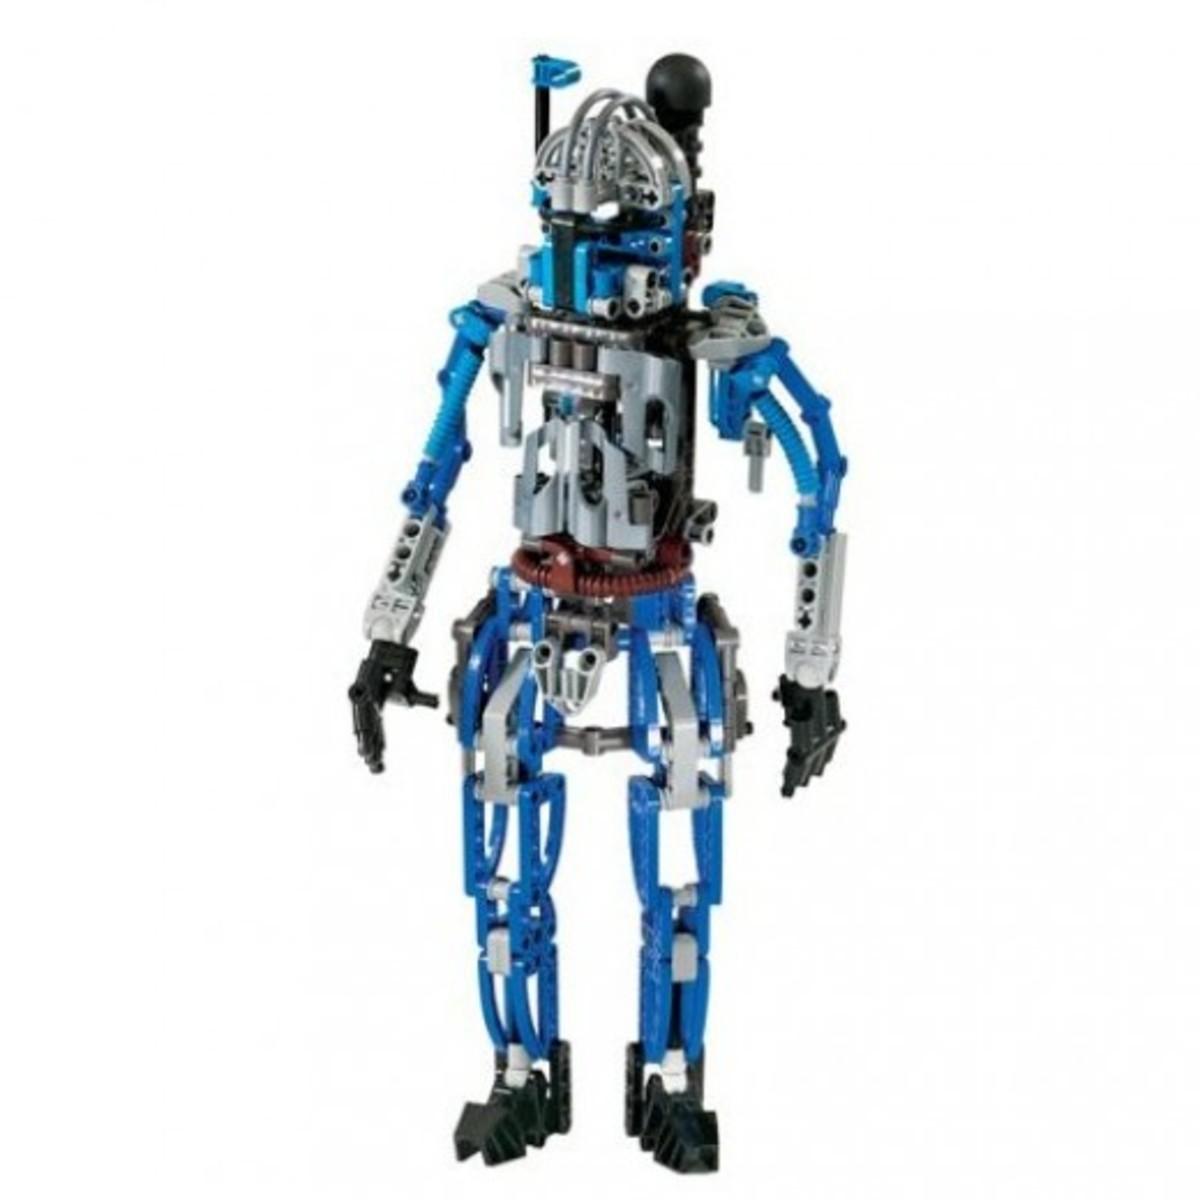 Lego Star Wars Jengo Fett 8011 Assembled